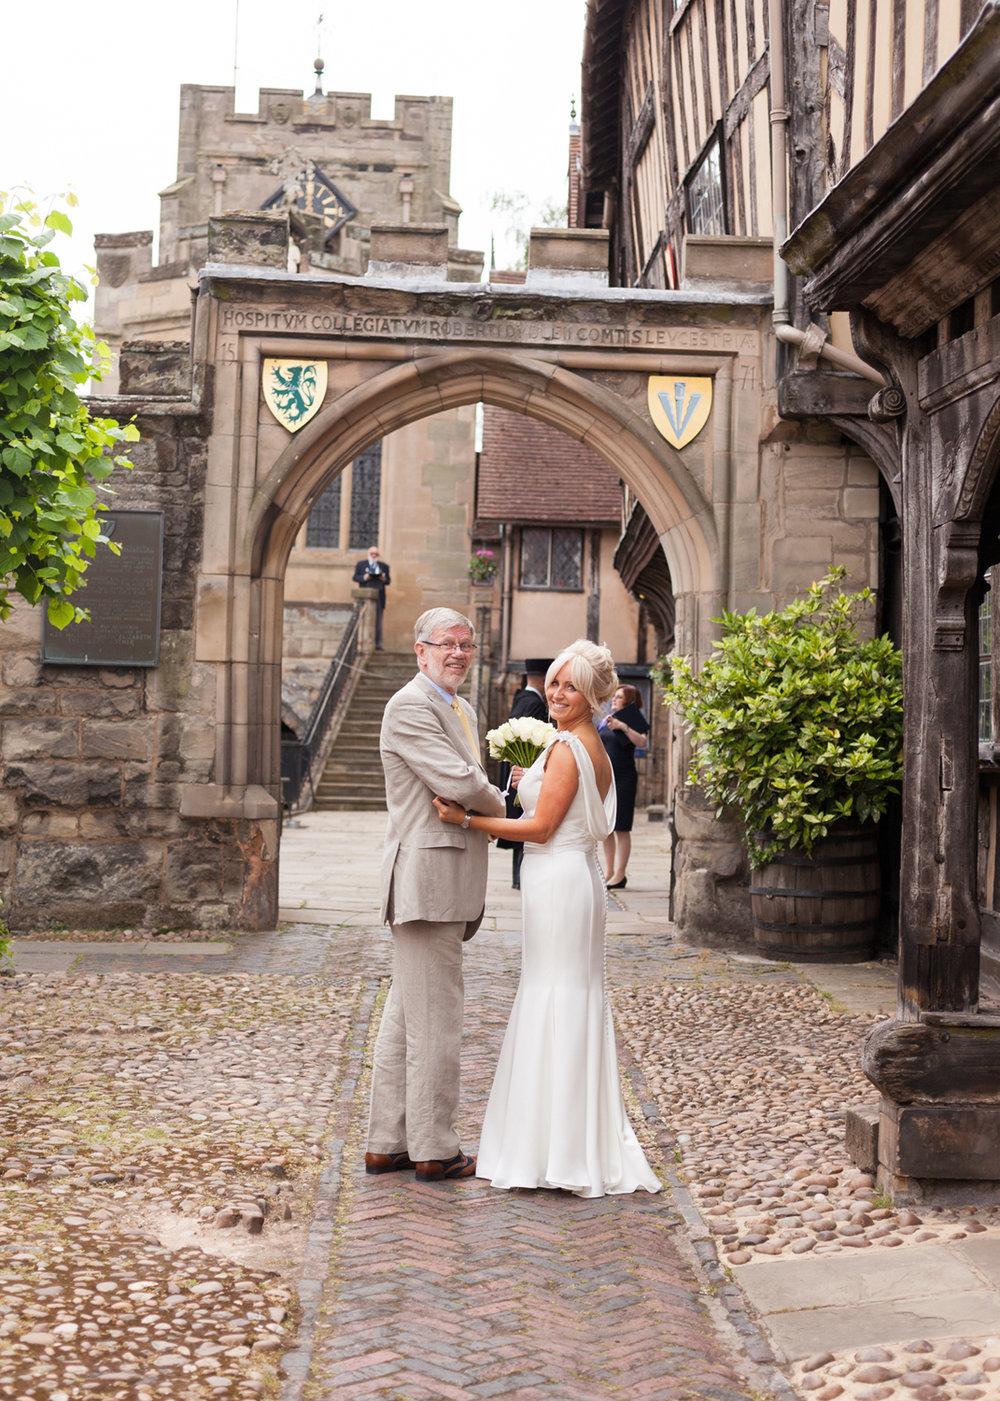 Wedding-Photography-Lord-Leycester-Hospital08.jpg